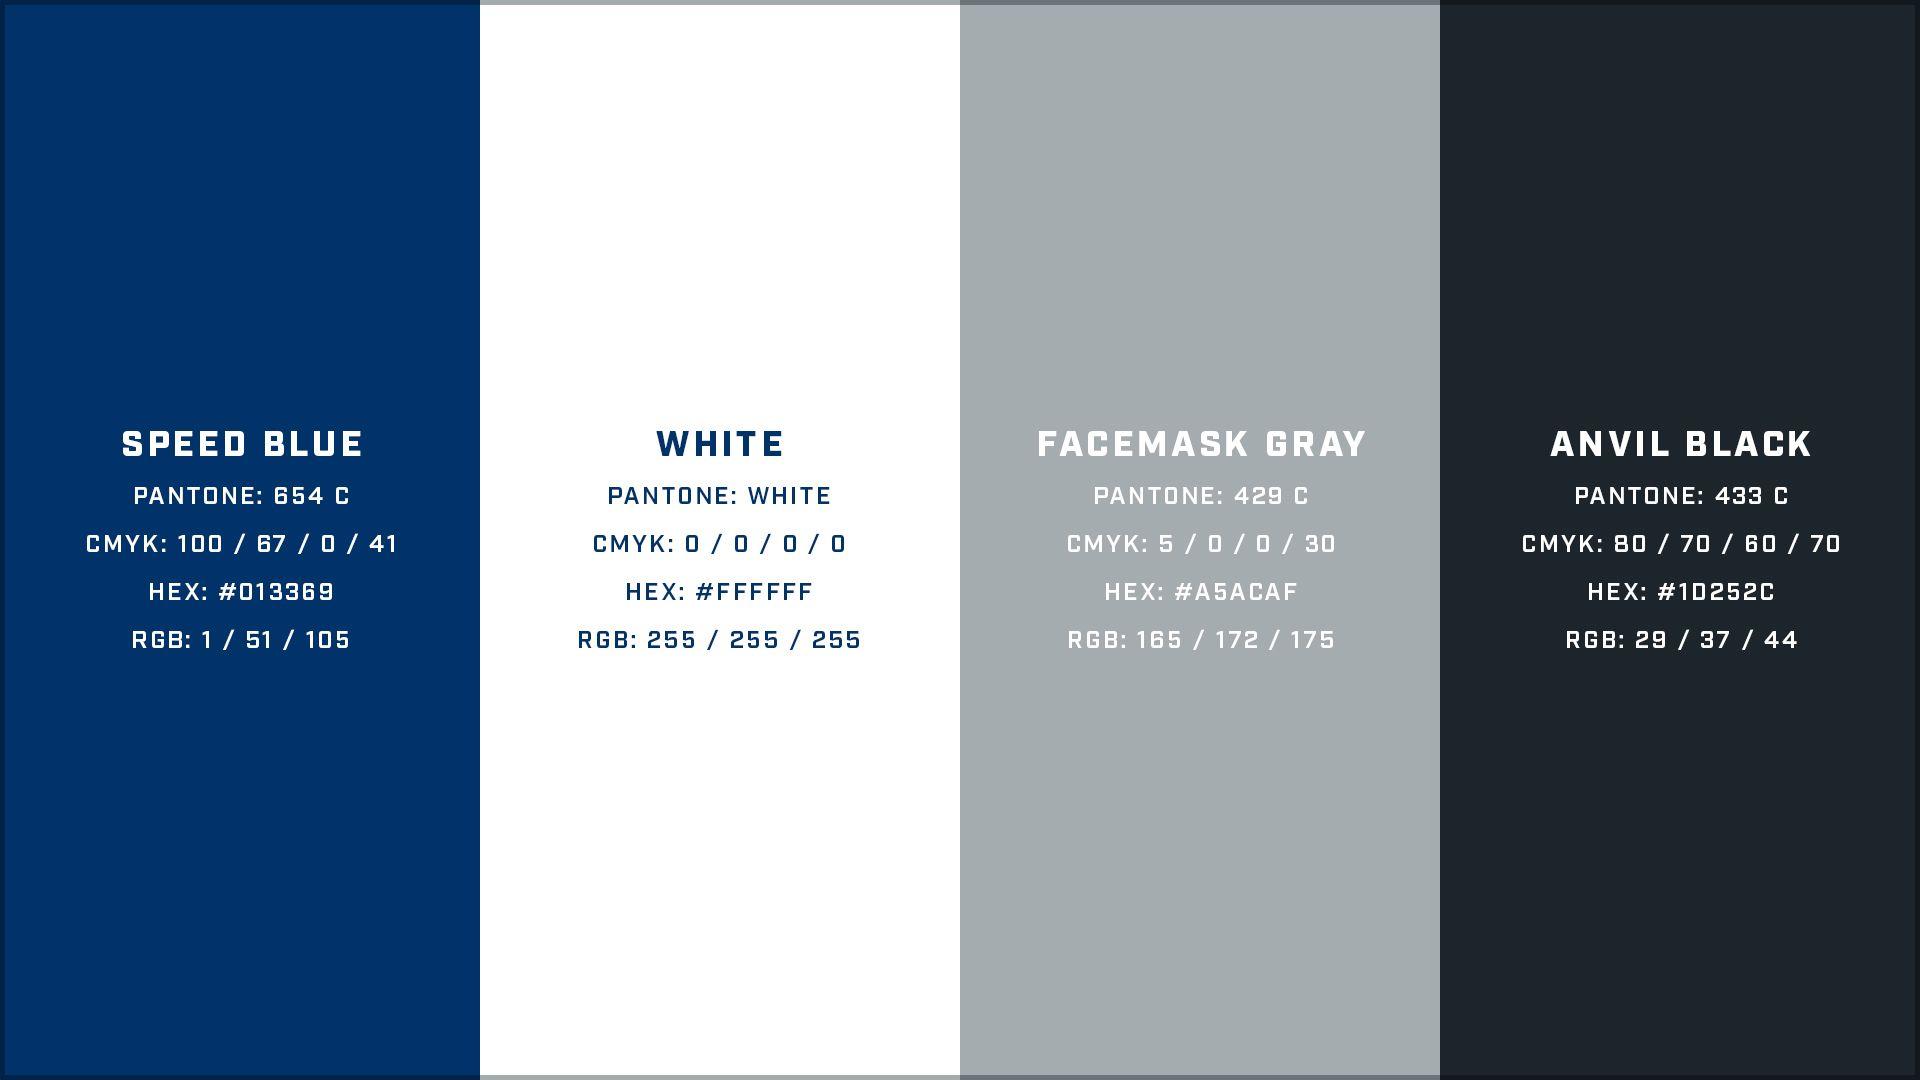 Official Colts Color Details: Speed Blue - Pantone: 654 C, CMYK: 100 / 67 / 0 / 41, HEX #013369, RGB: 1 / 51 / 105; White - Pantone: White, CMYK: 0 / 0 / 0 / 0, HEX #ffffff, RGB: 255 / 255 / 255; Facemask Gray - Pantone: 429 C, CMYK: 5 / 0 / 0 / 30, HEX #A5ACAF, RGB: 165 / 172 / 175; Anvil Black - Pantone: 433 C, CMYK: 80 / 70 / 60 / 70, HEX #1D252C, RGB: 29 / 37 / 44